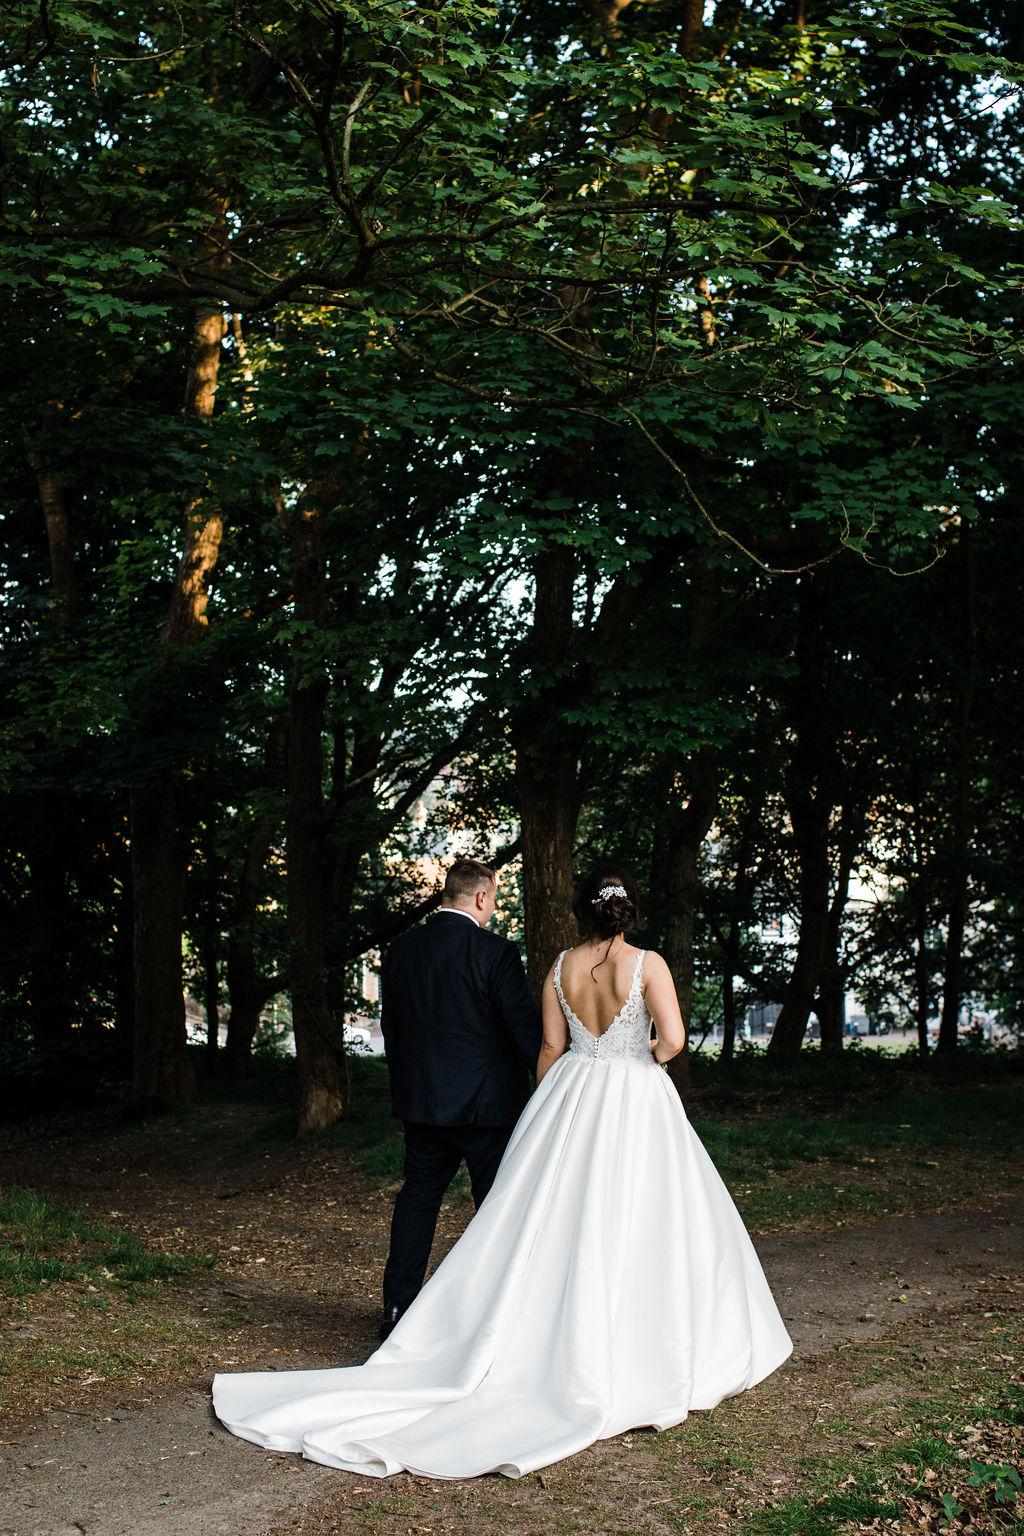 Your_Wedding_Day_480.jpg